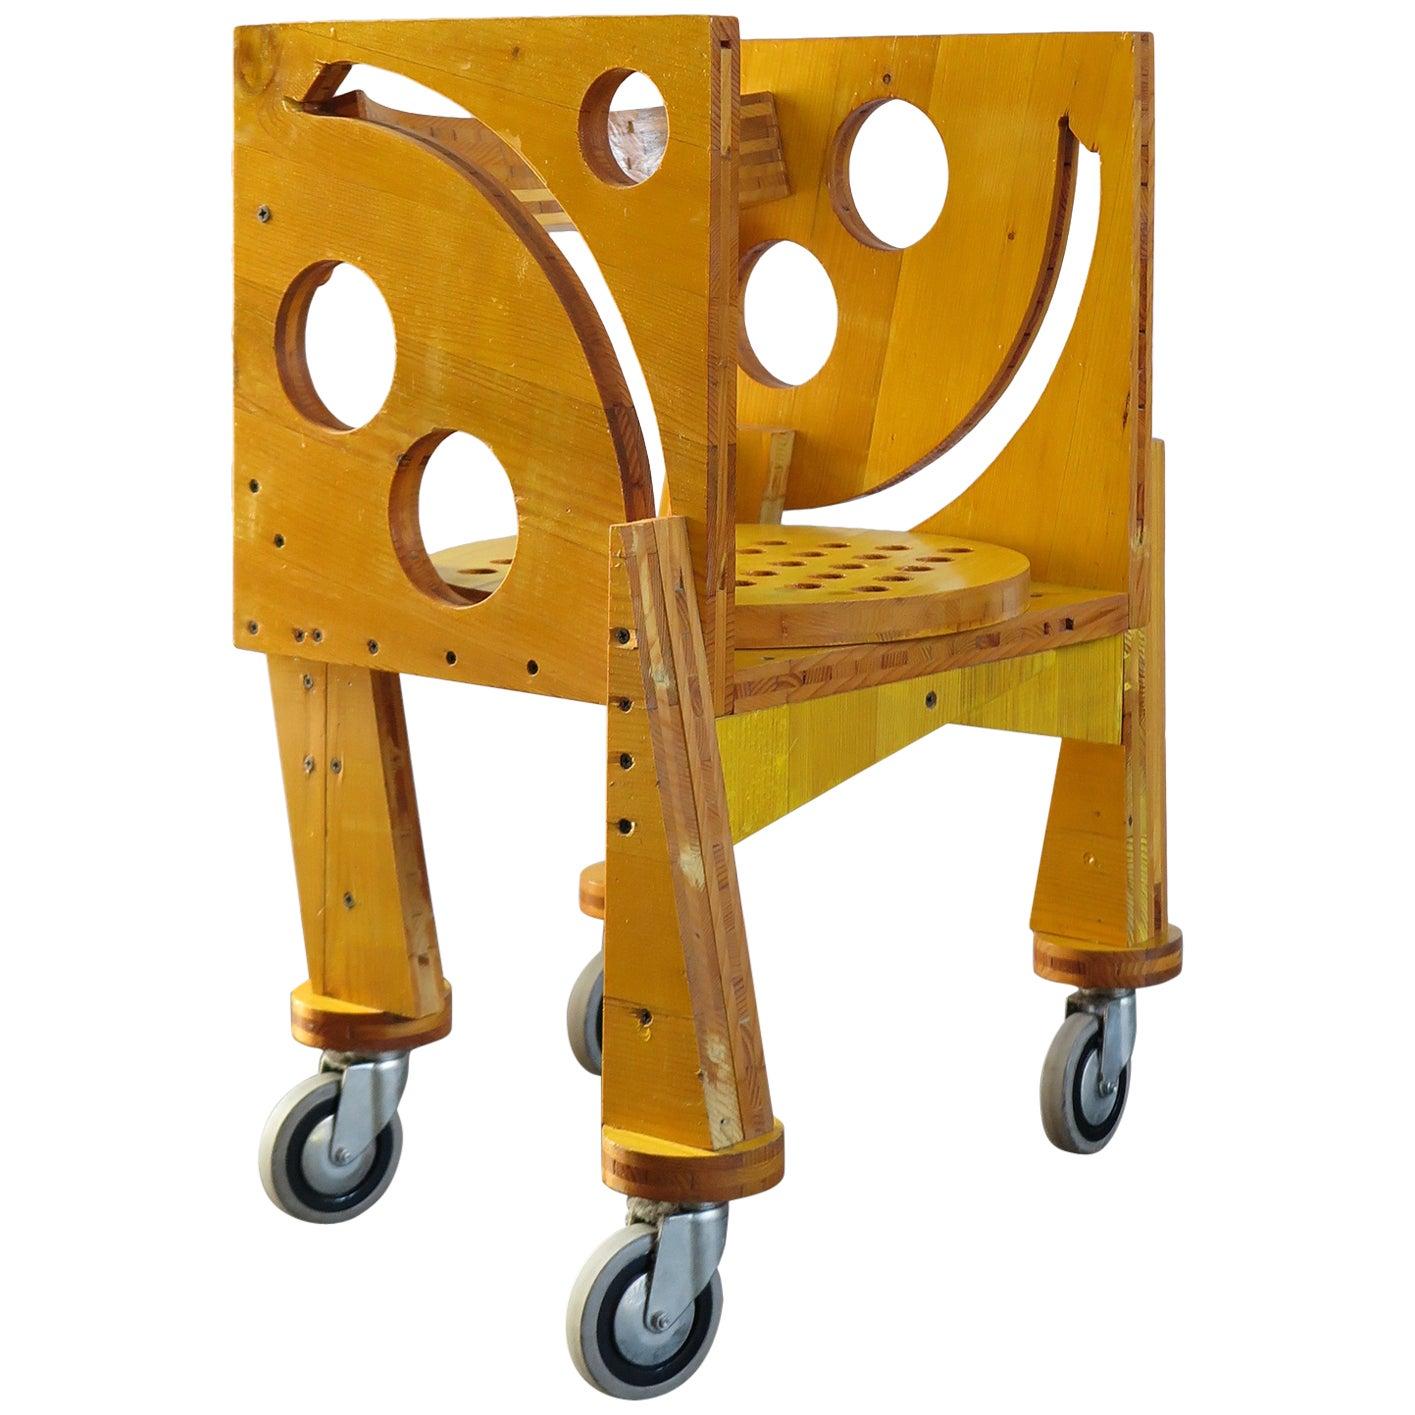 Cesare Leonardi Italian Wood Prototype Chair, 1990s